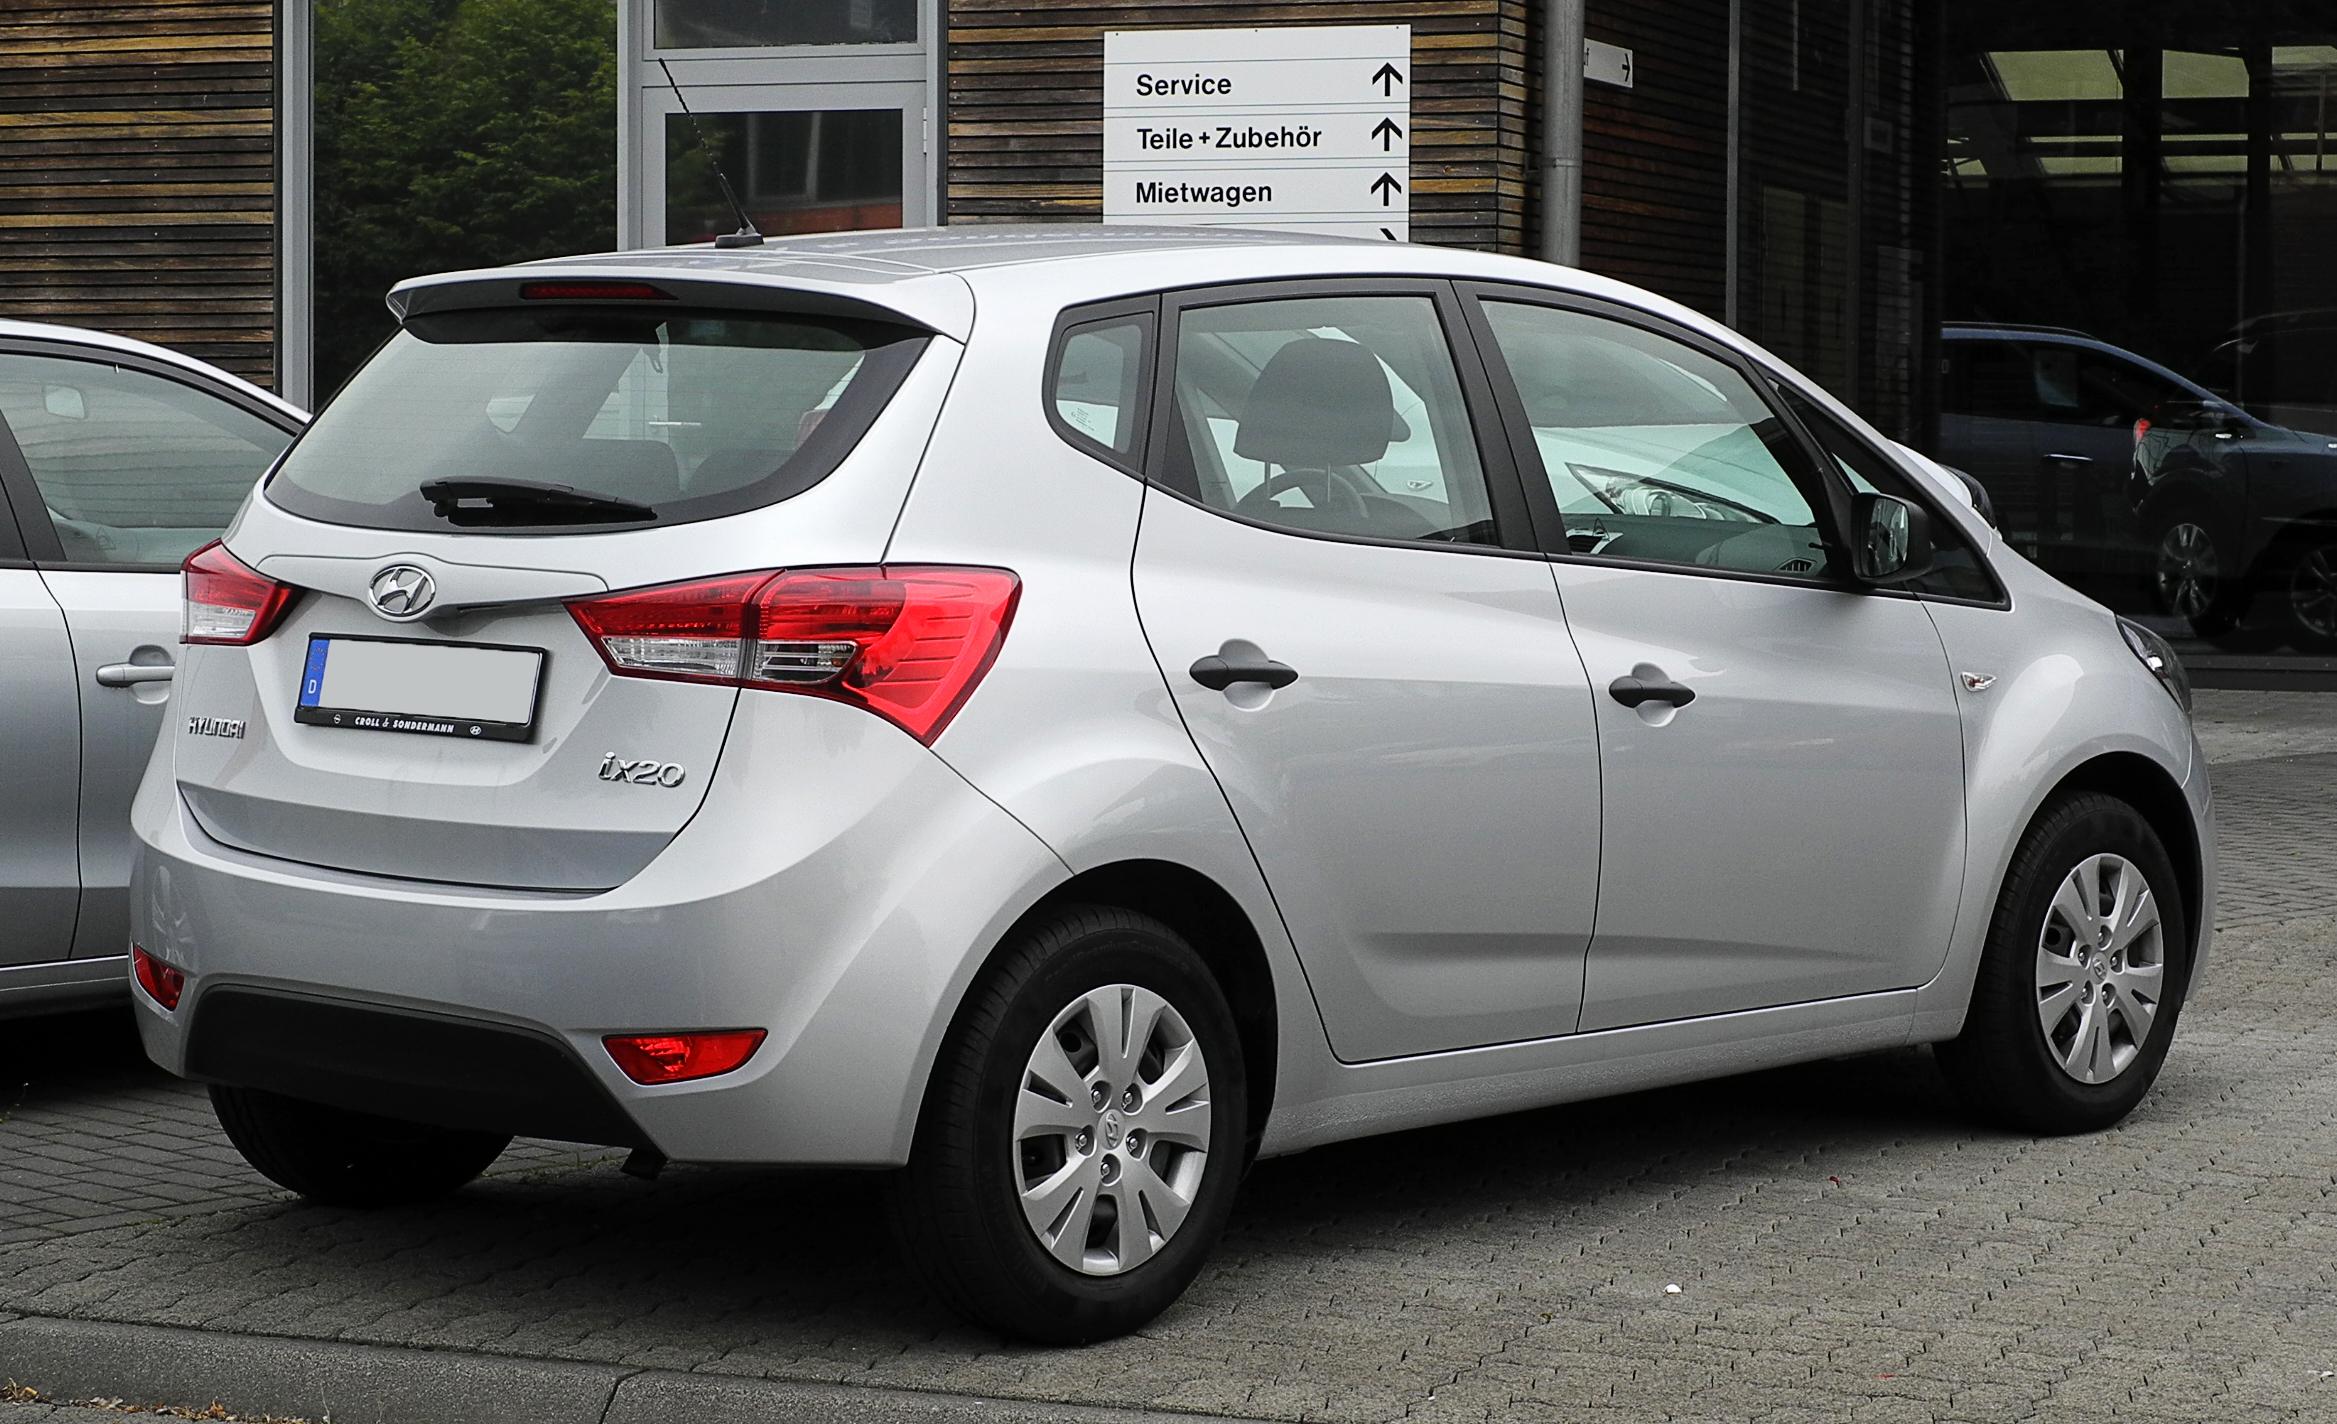 Ficheiro:Hyundai ix20 1.4 Classic – Heckansicht, 13. Juni ...